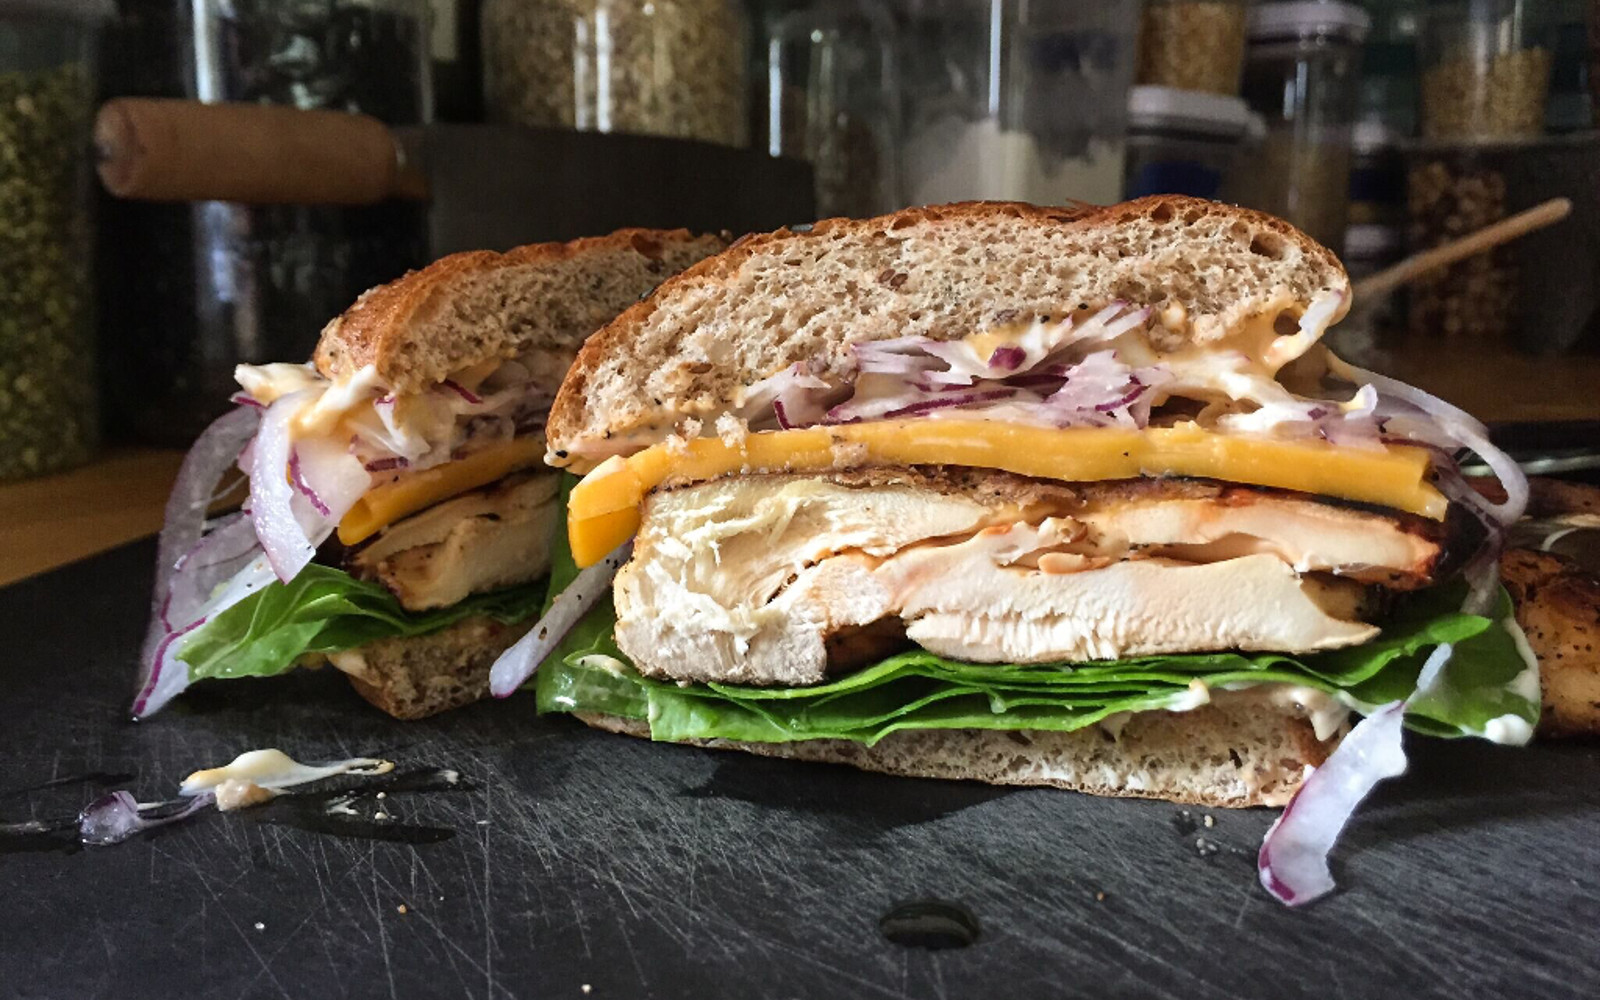 Vegan grilled chicken of the woods sandwich cut in half